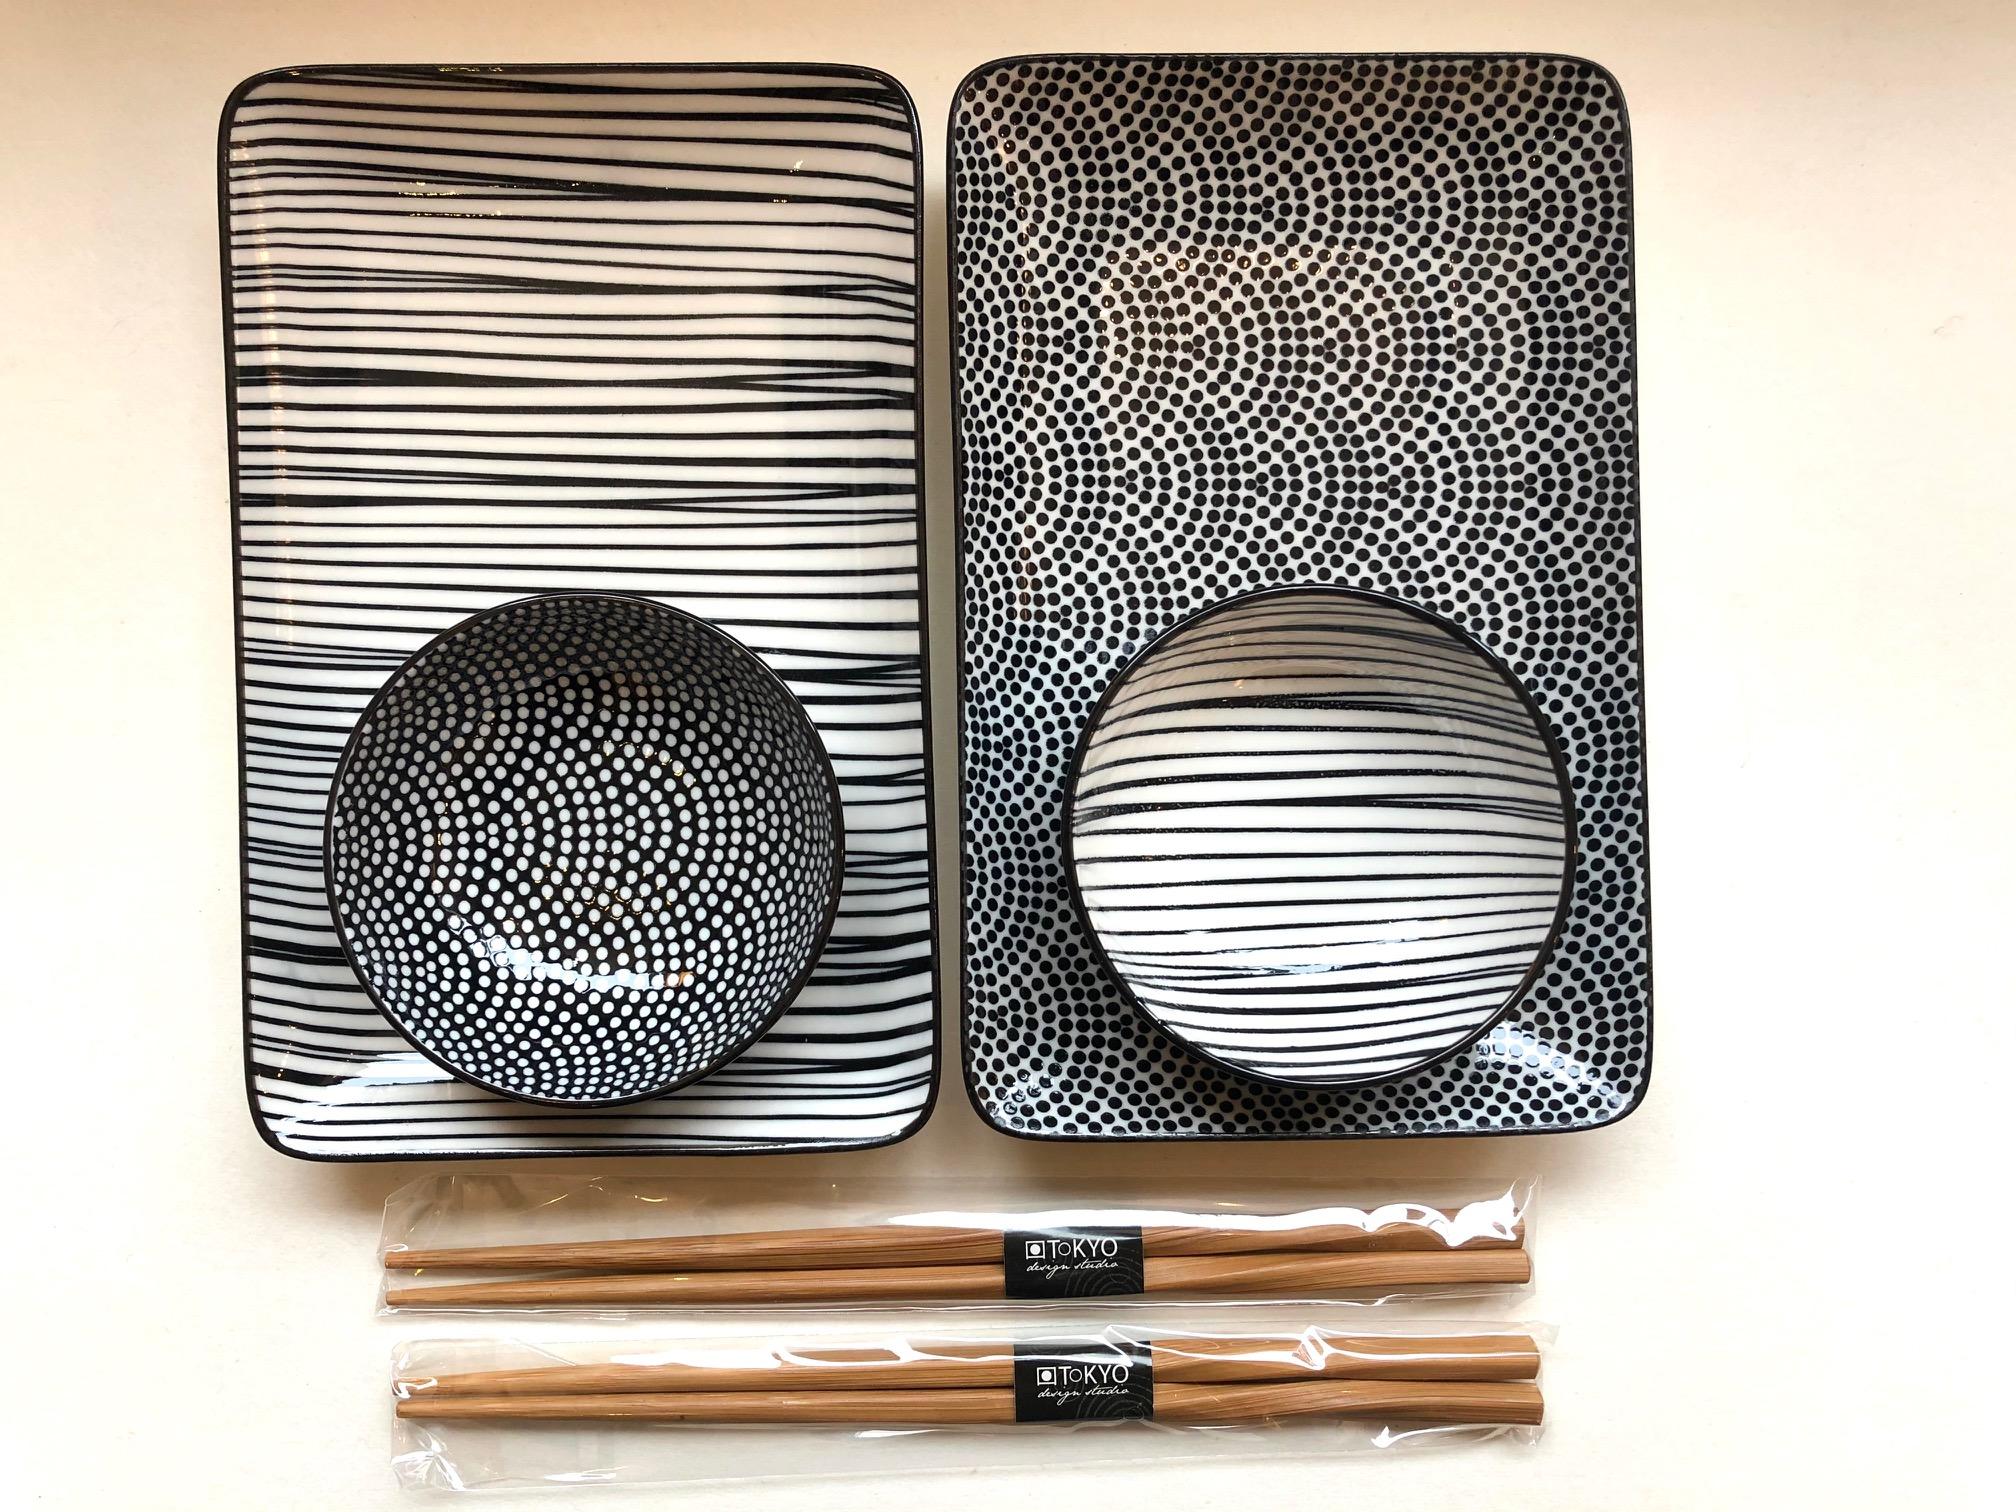 Sushi-Set Nihon schwarzweiss